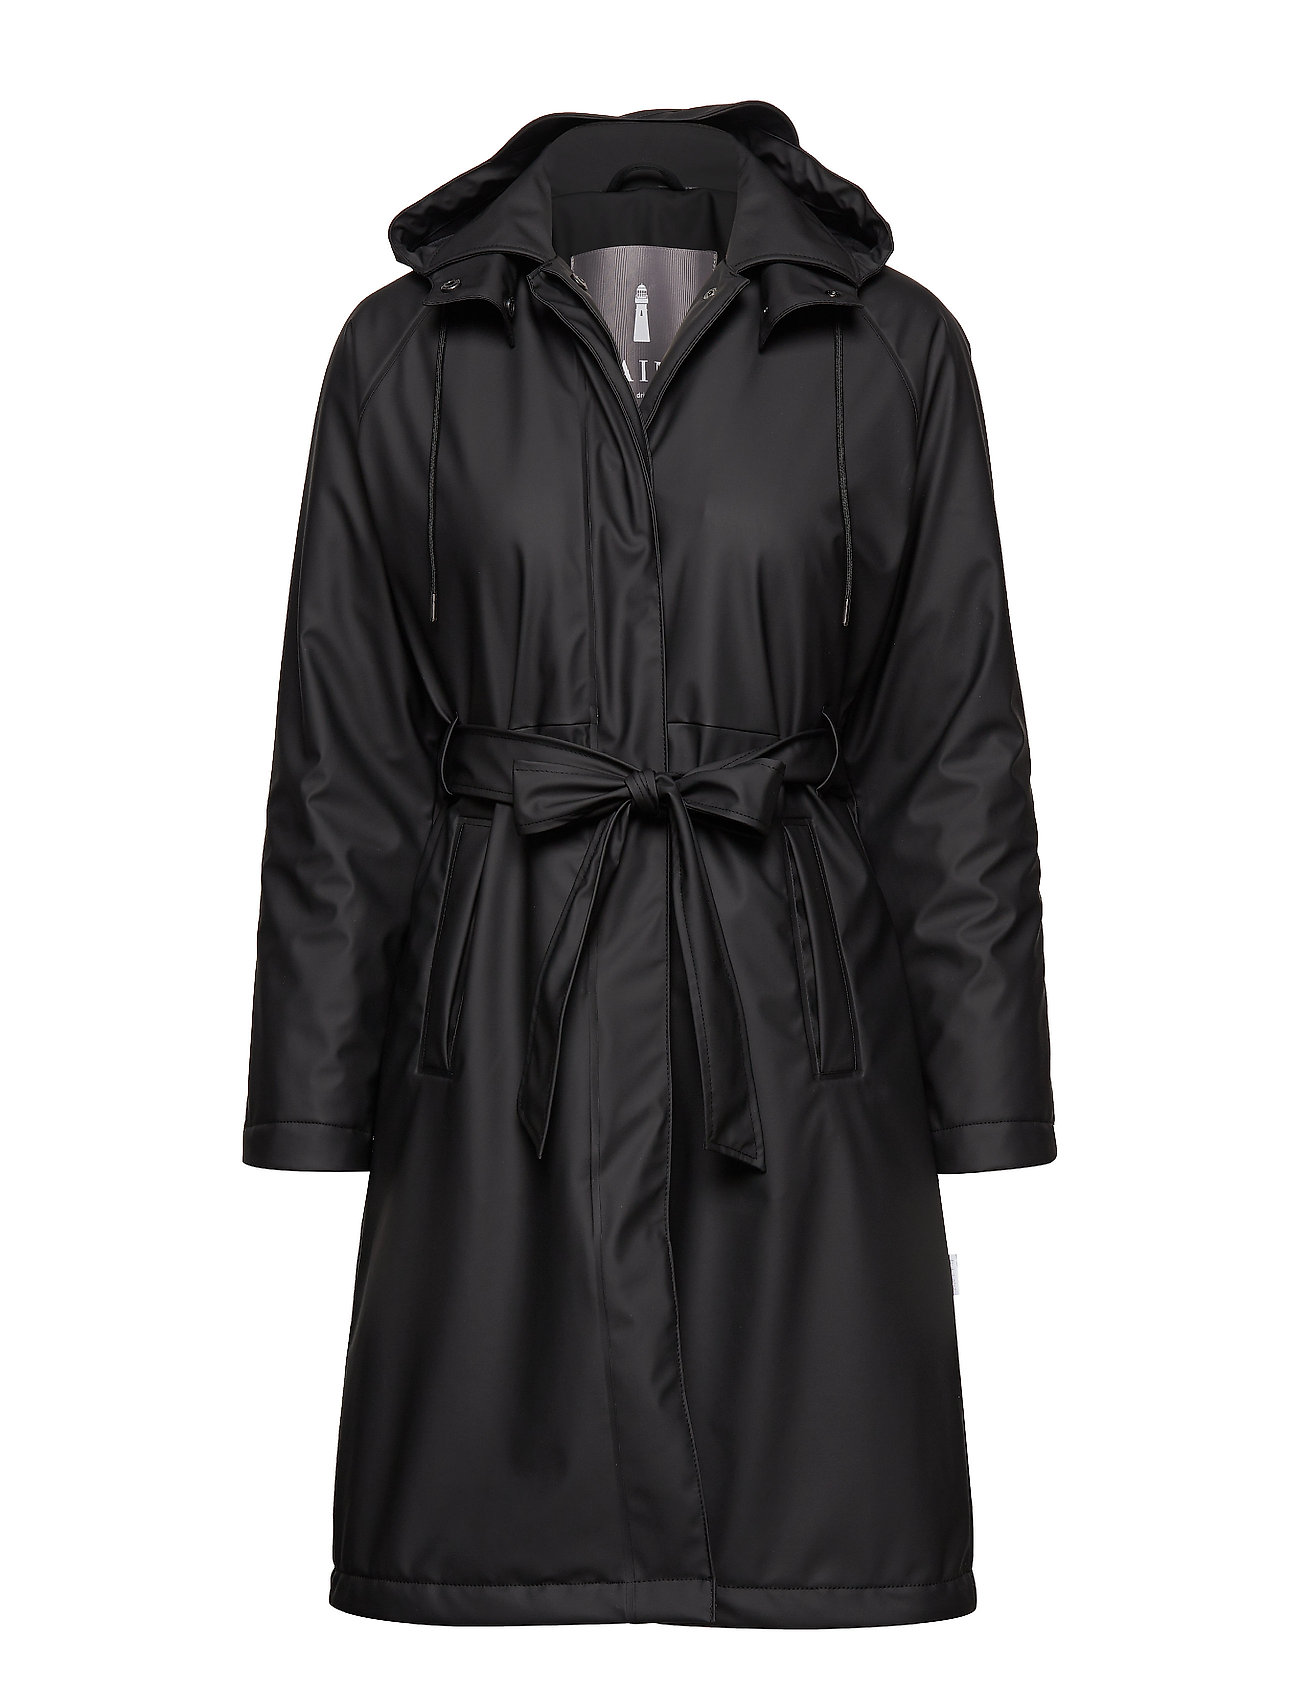 Rains W Trench Coat - 01 BLACK